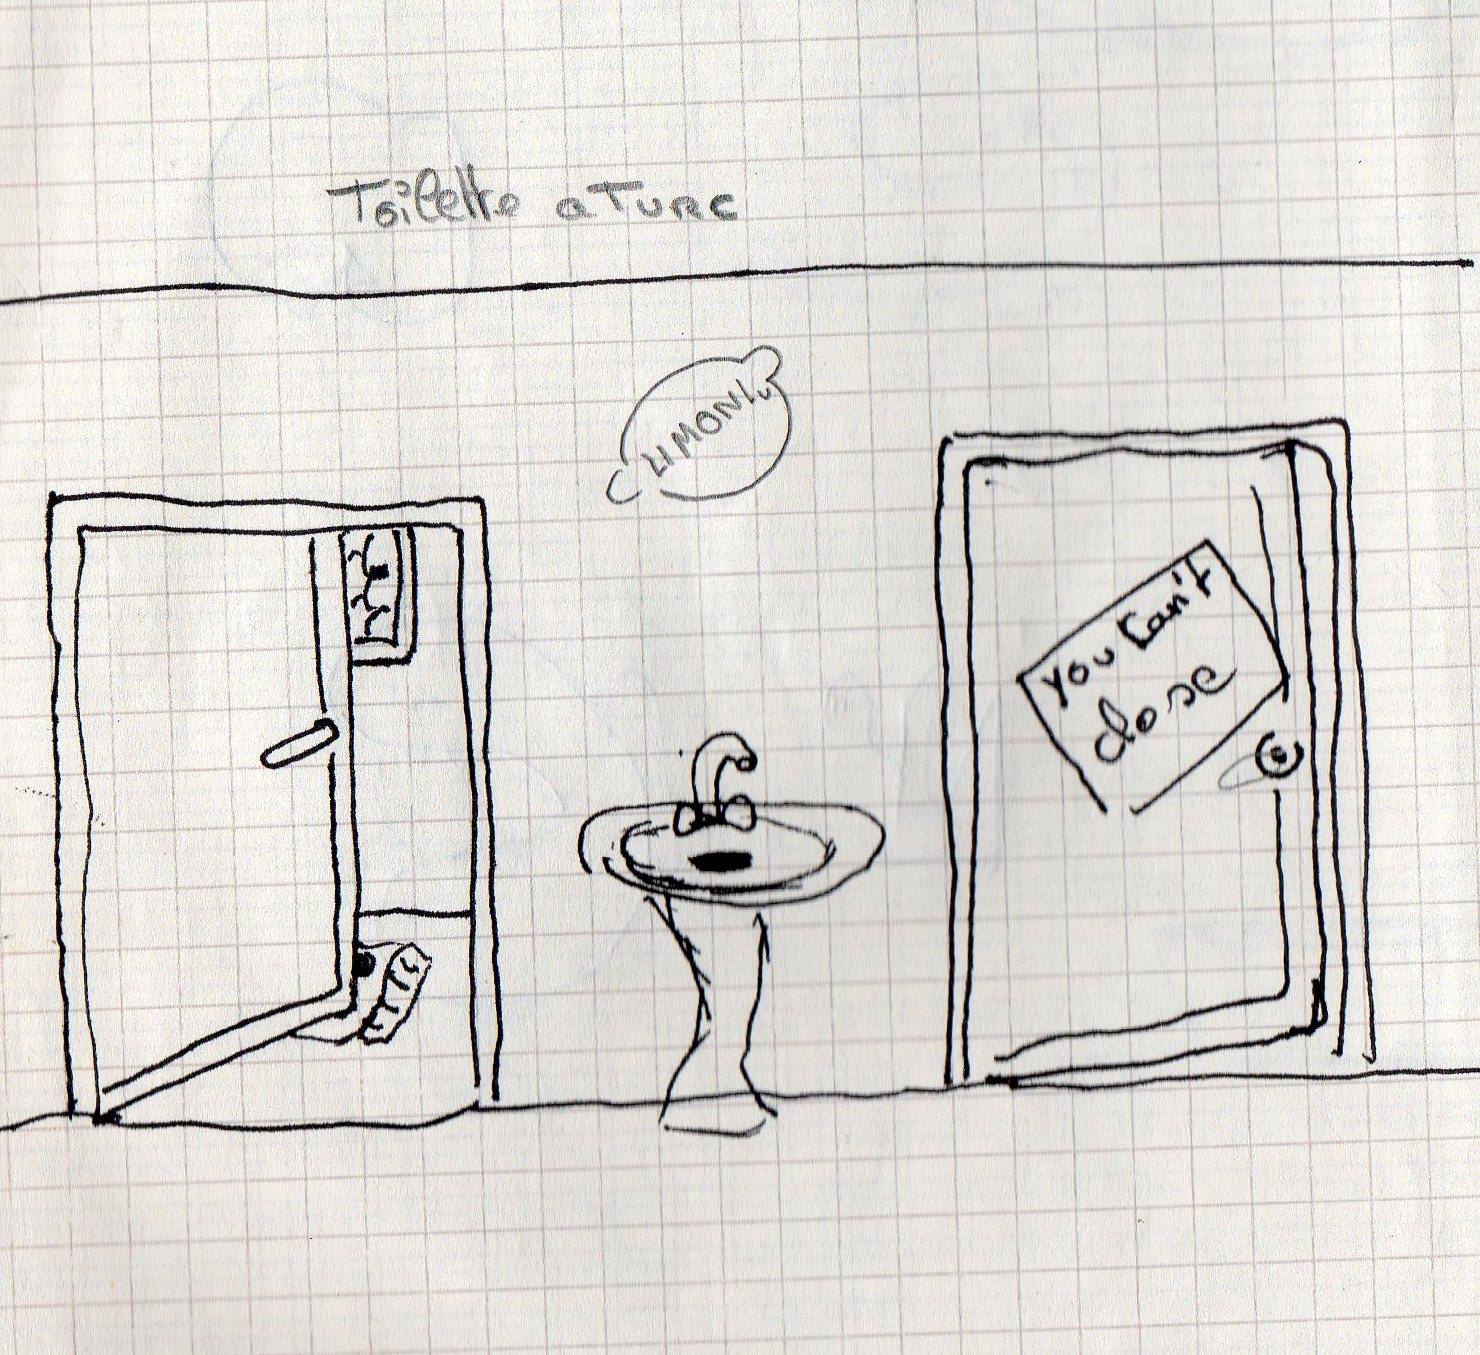 http://www.prise2tete.fr/upload/piode-limonlutoilette.jpg